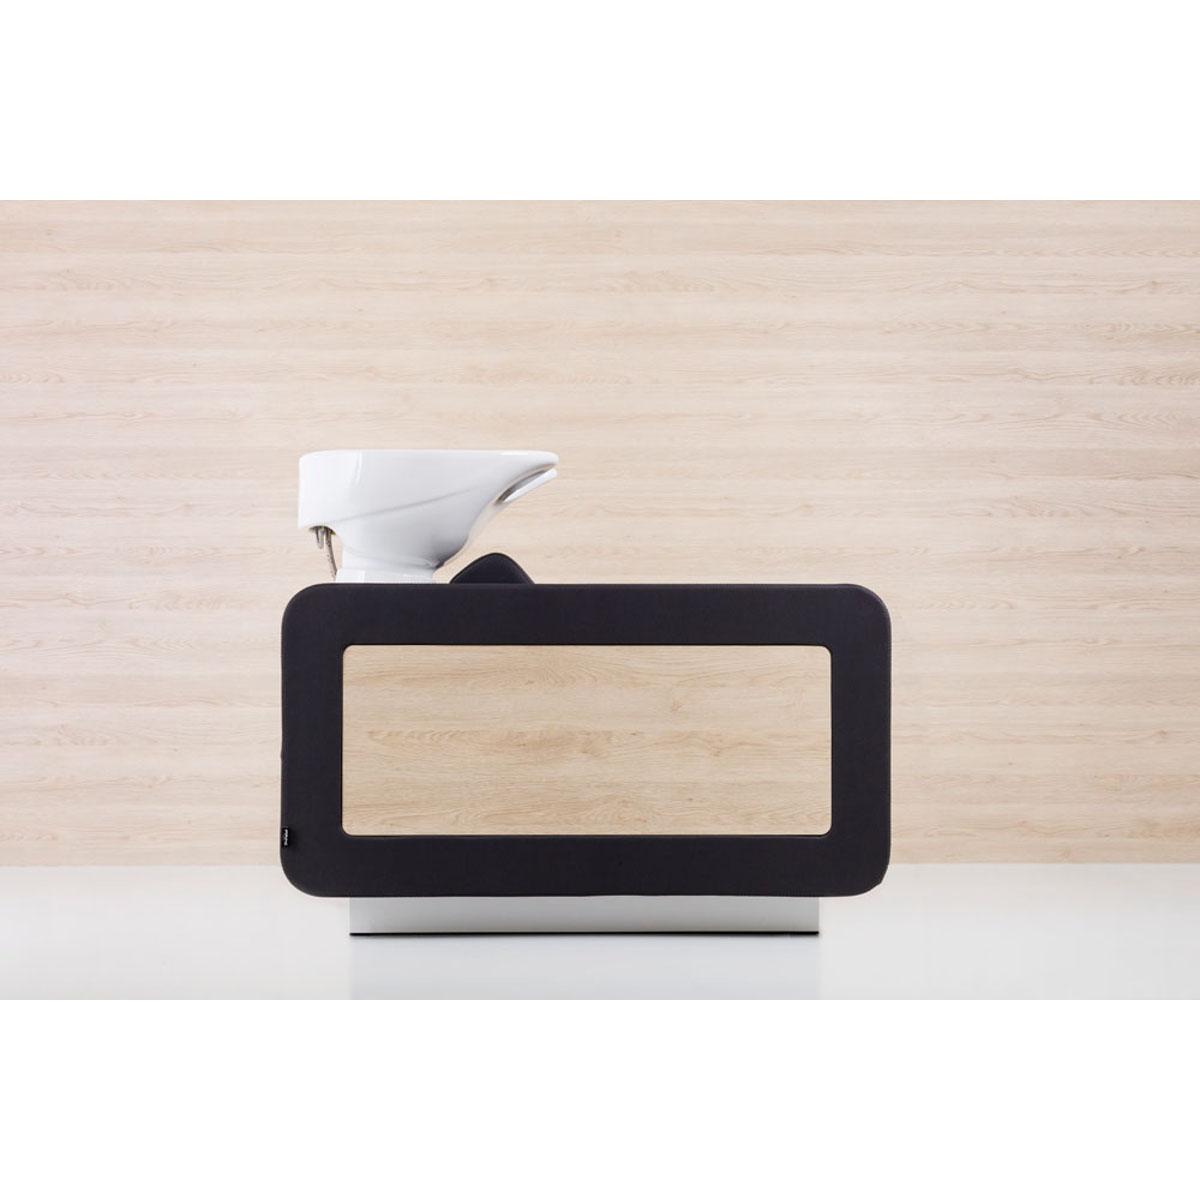 forty relax lectrique bac de lavage mobicoiff. Black Bedroom Furniture Sets. Home Design Ideas